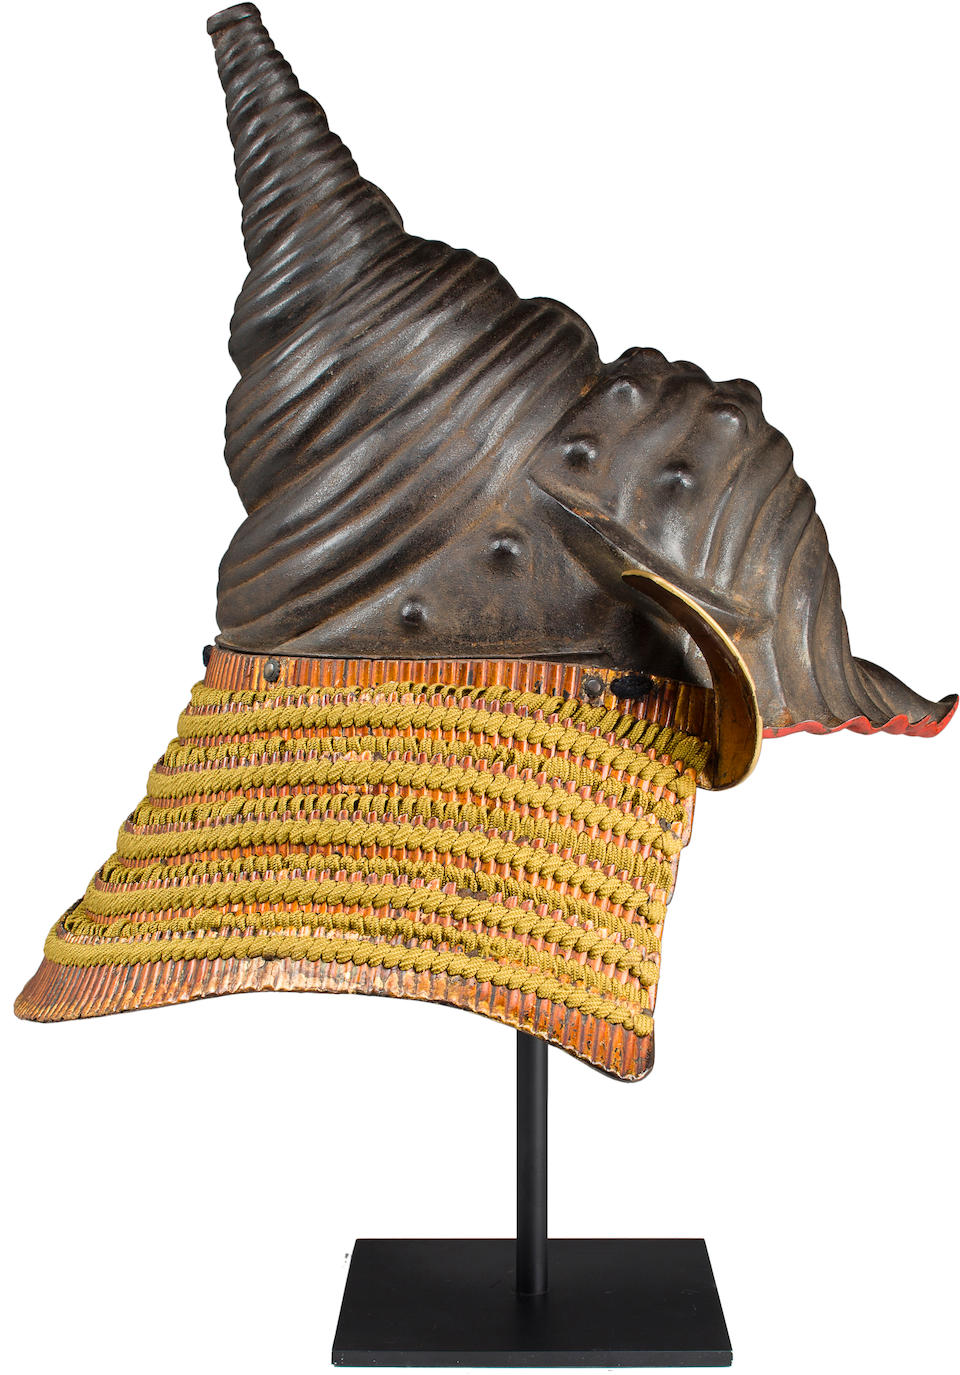 A shell-shaped kawari kabuto (eccentrically shaped helmet) By Mitsuhisa, Edo period (18th century)